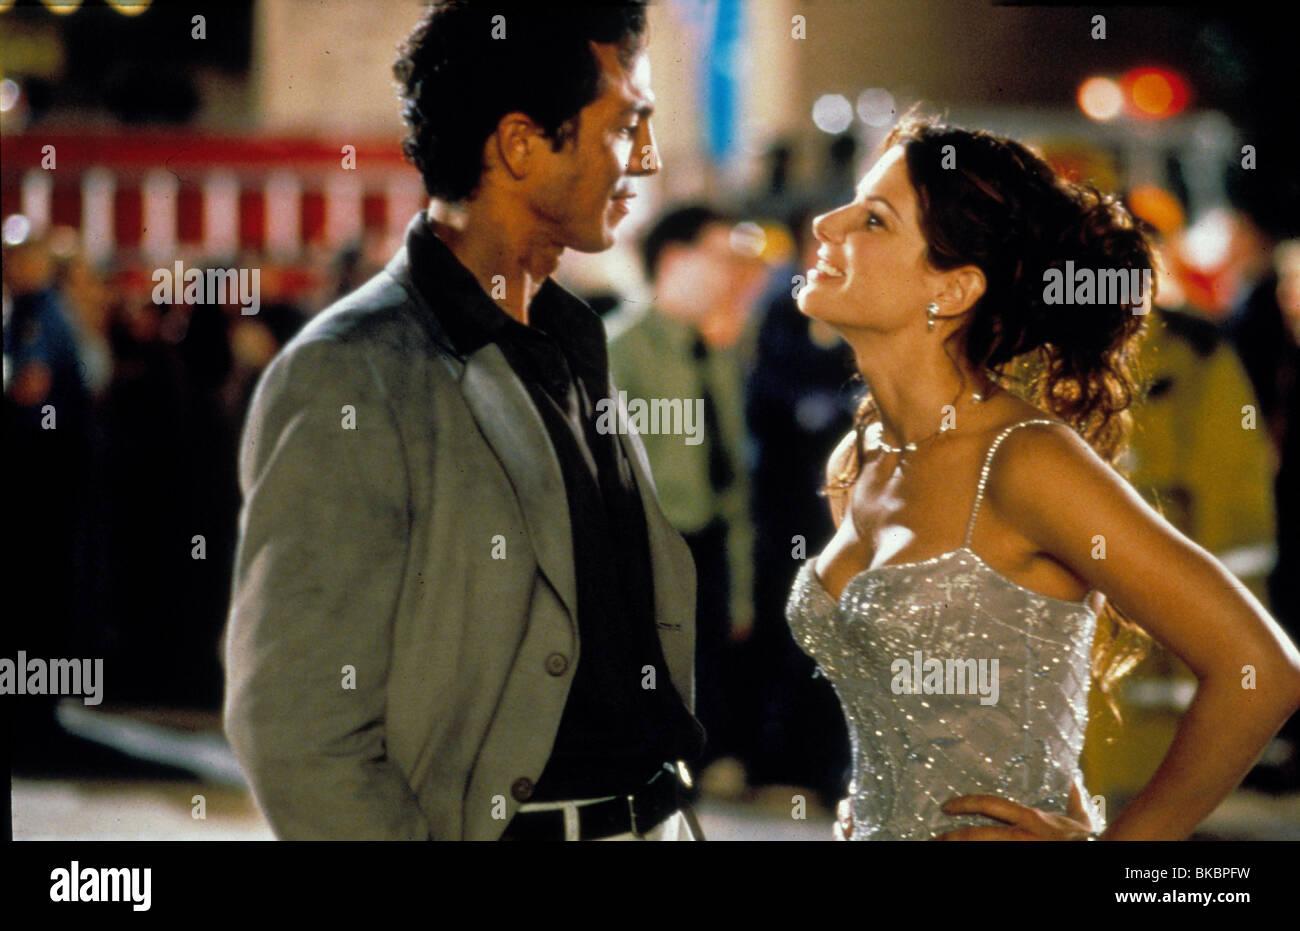 Miss Congeniality 2000 Benjamin Bratt Sandra Bullock Mgen 038 Stock Photo Alamy